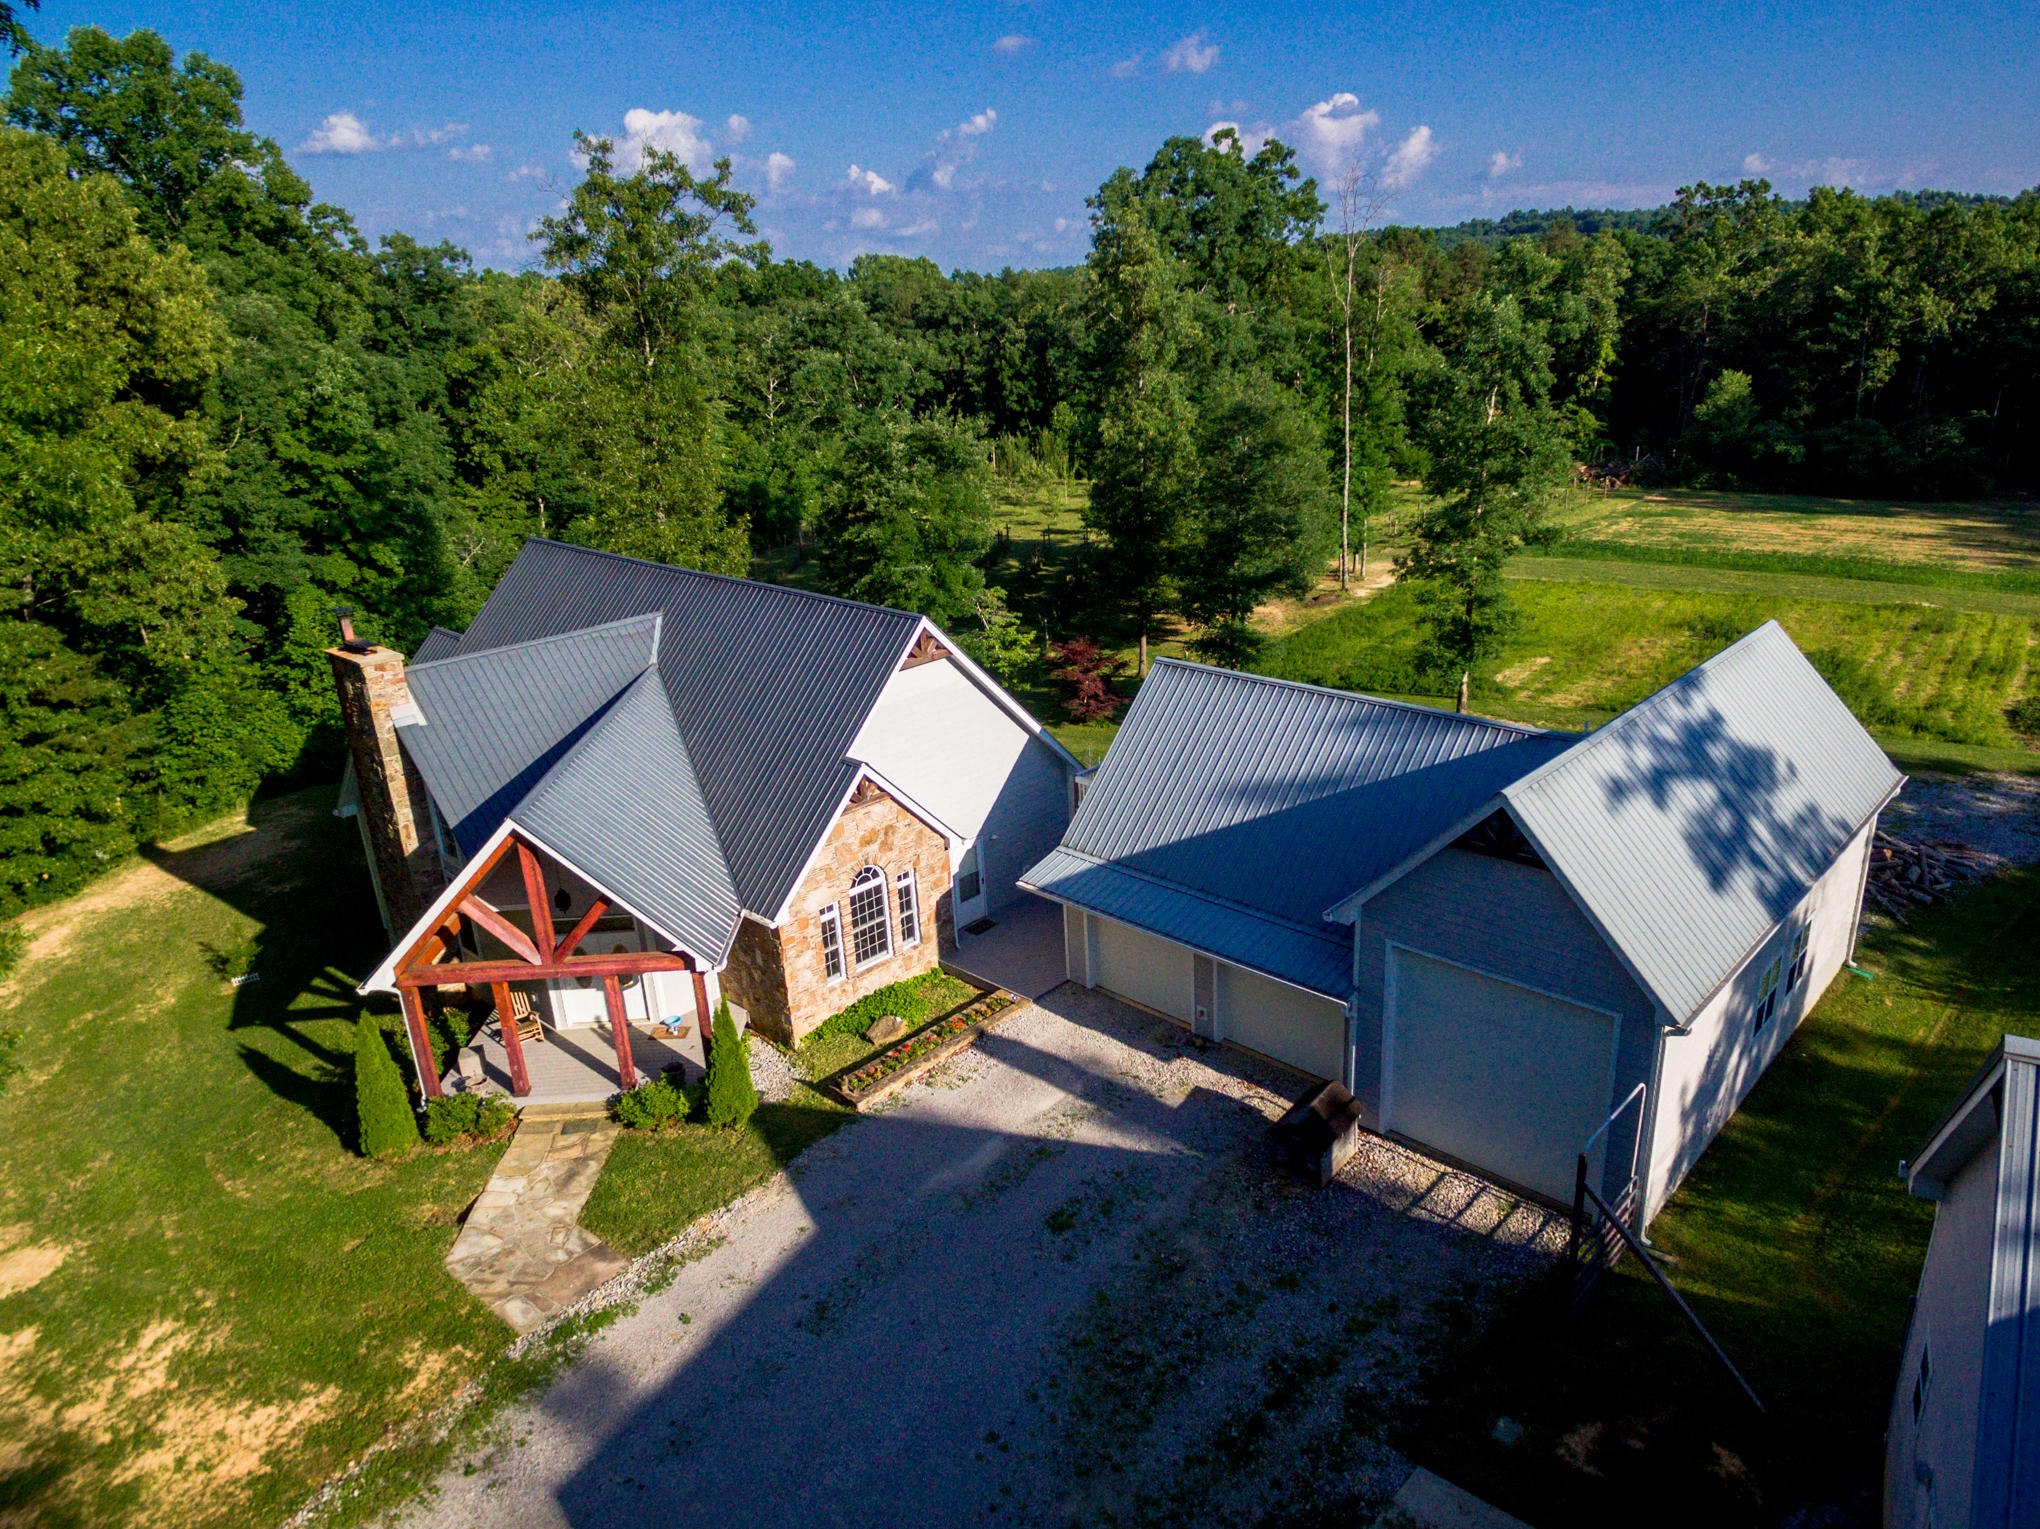 370 Caldwell Rd, Coalmont, TN 37313